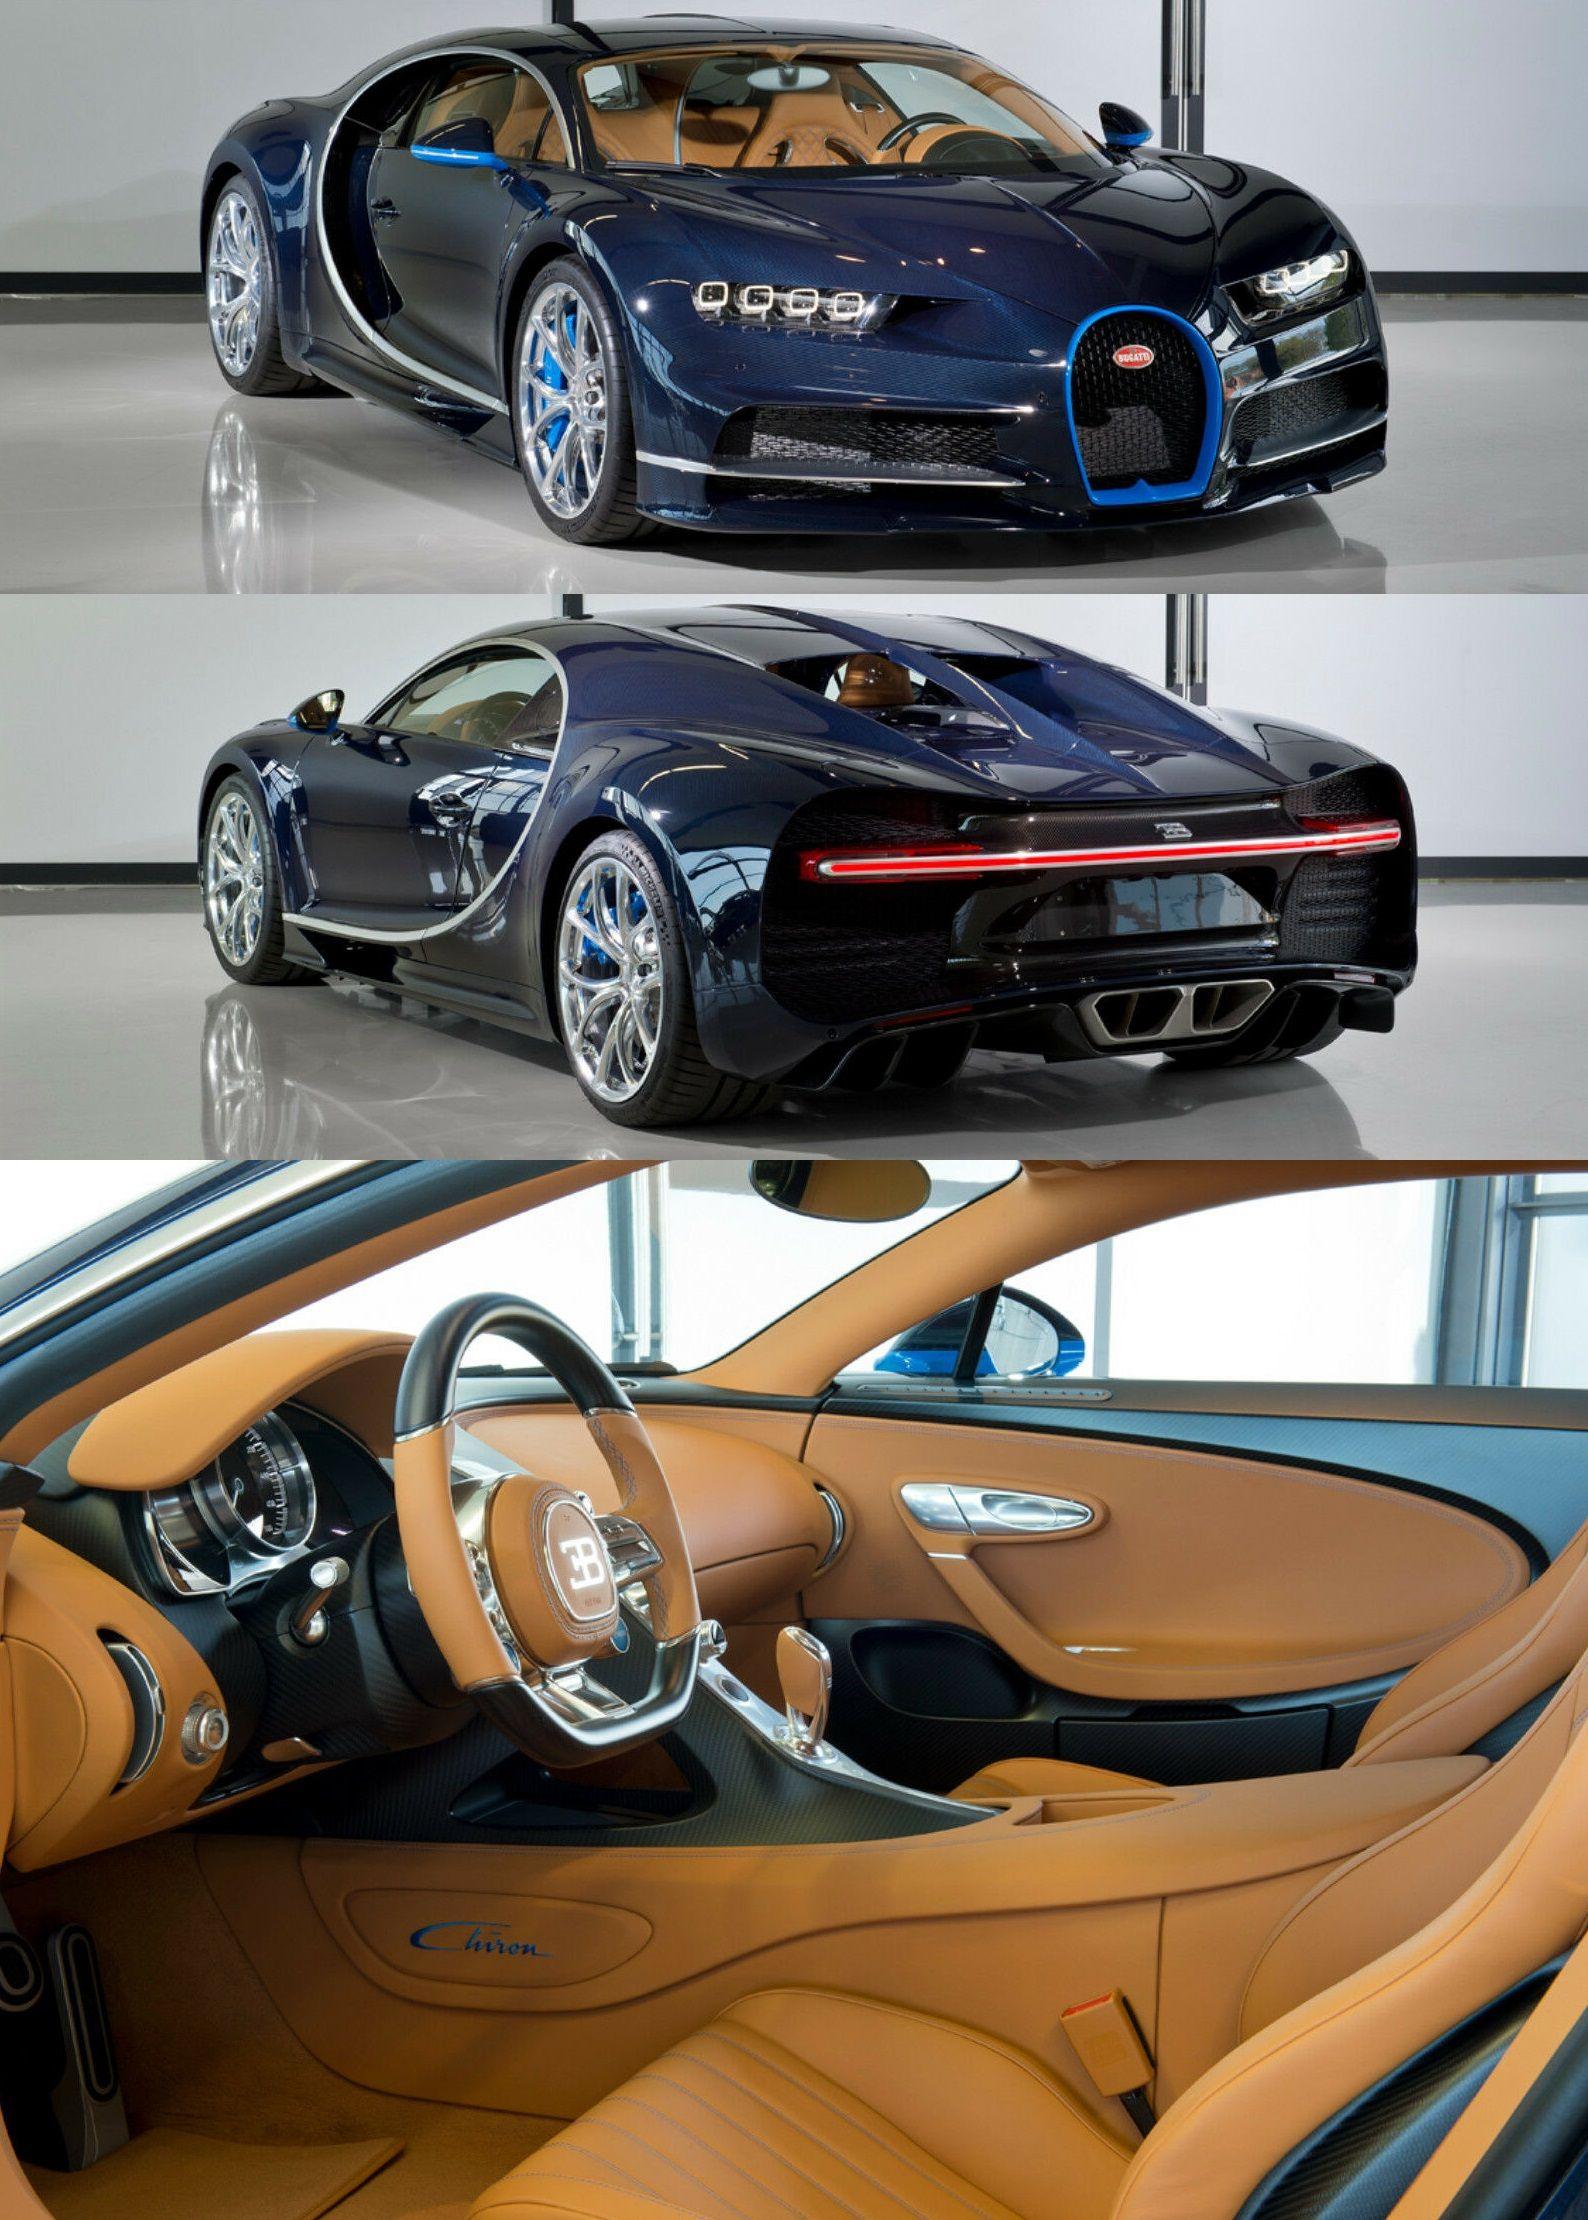 Bugatti Chiron Bugatti Chiron Super Luxury Cars Bugatti